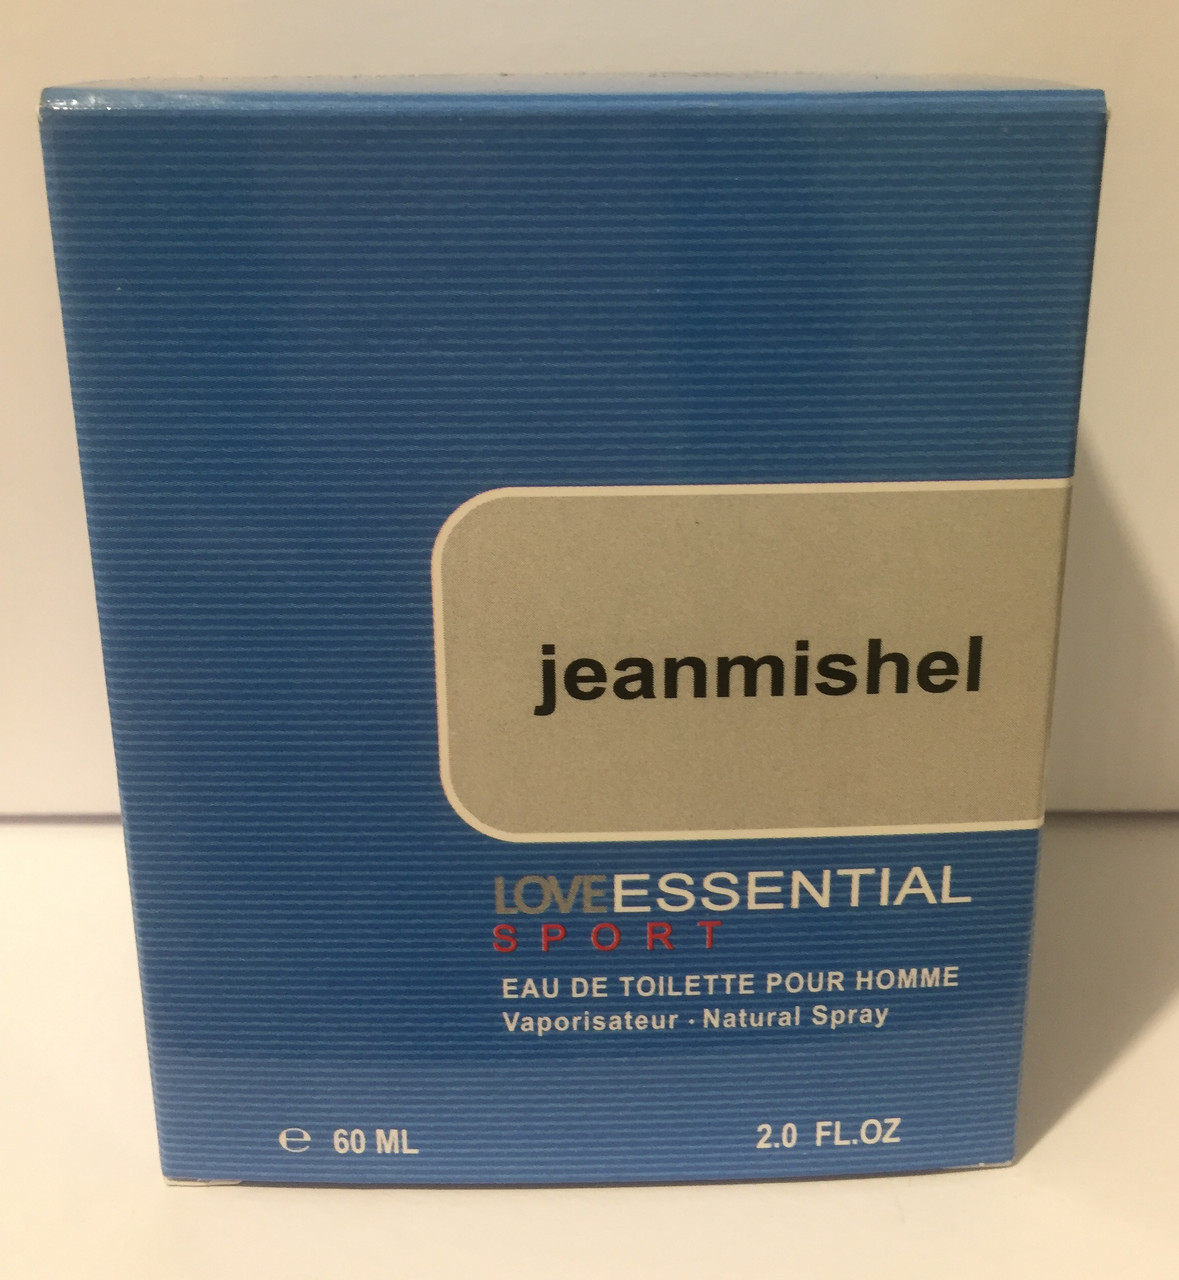 Тестер в подарочной упаковке jeanmishel loveEssential Sport 60 мл